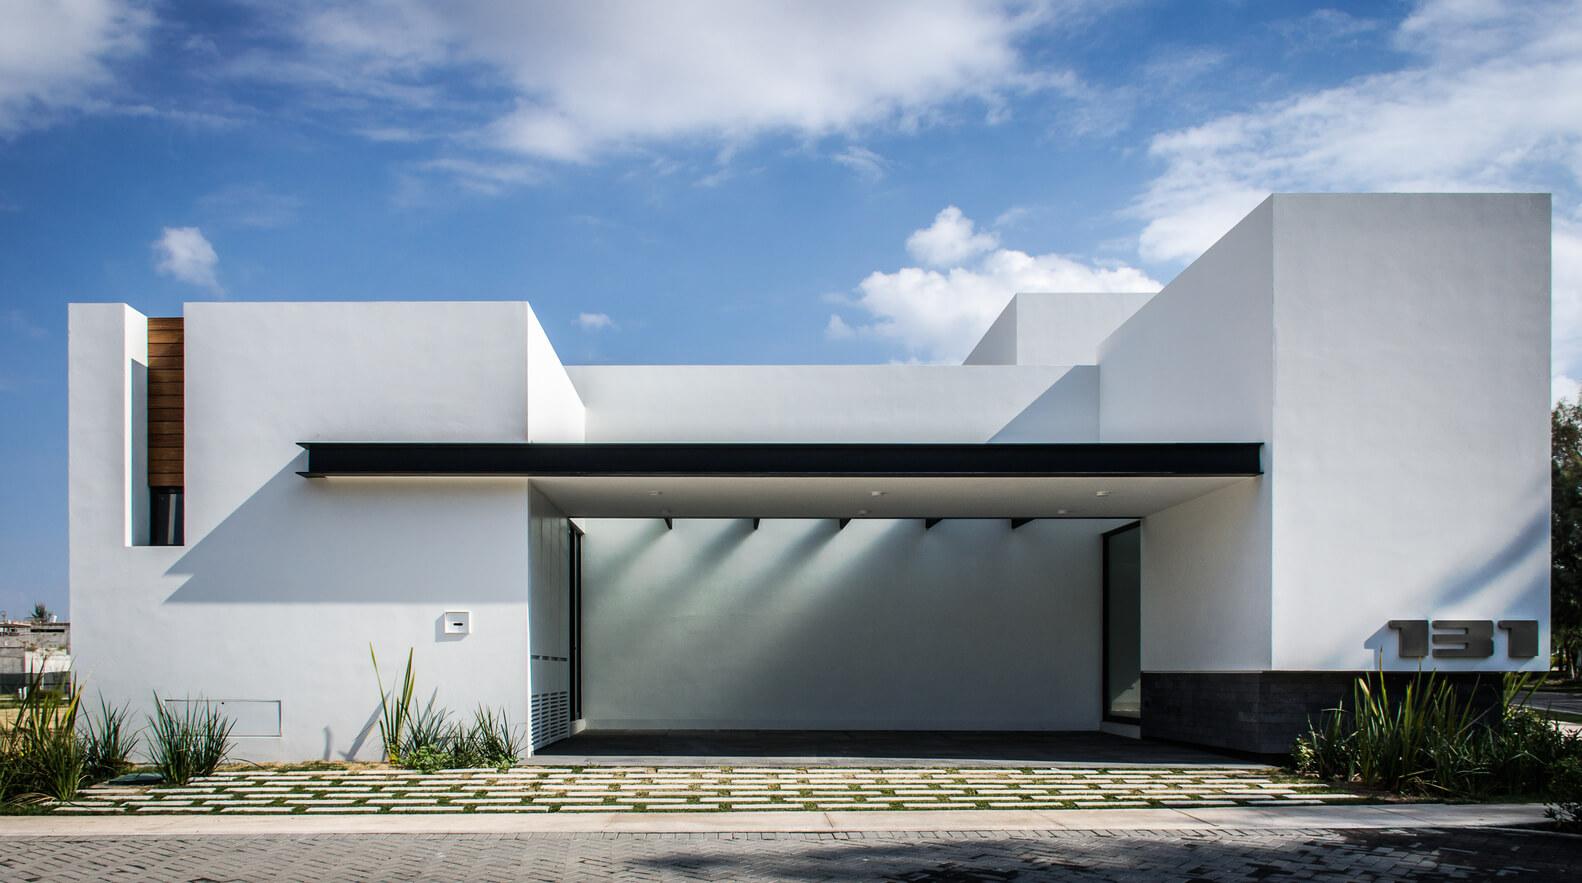 16 fachadas modernas diganas de imitar interiores for Fachadas de casas minimalistas 2016